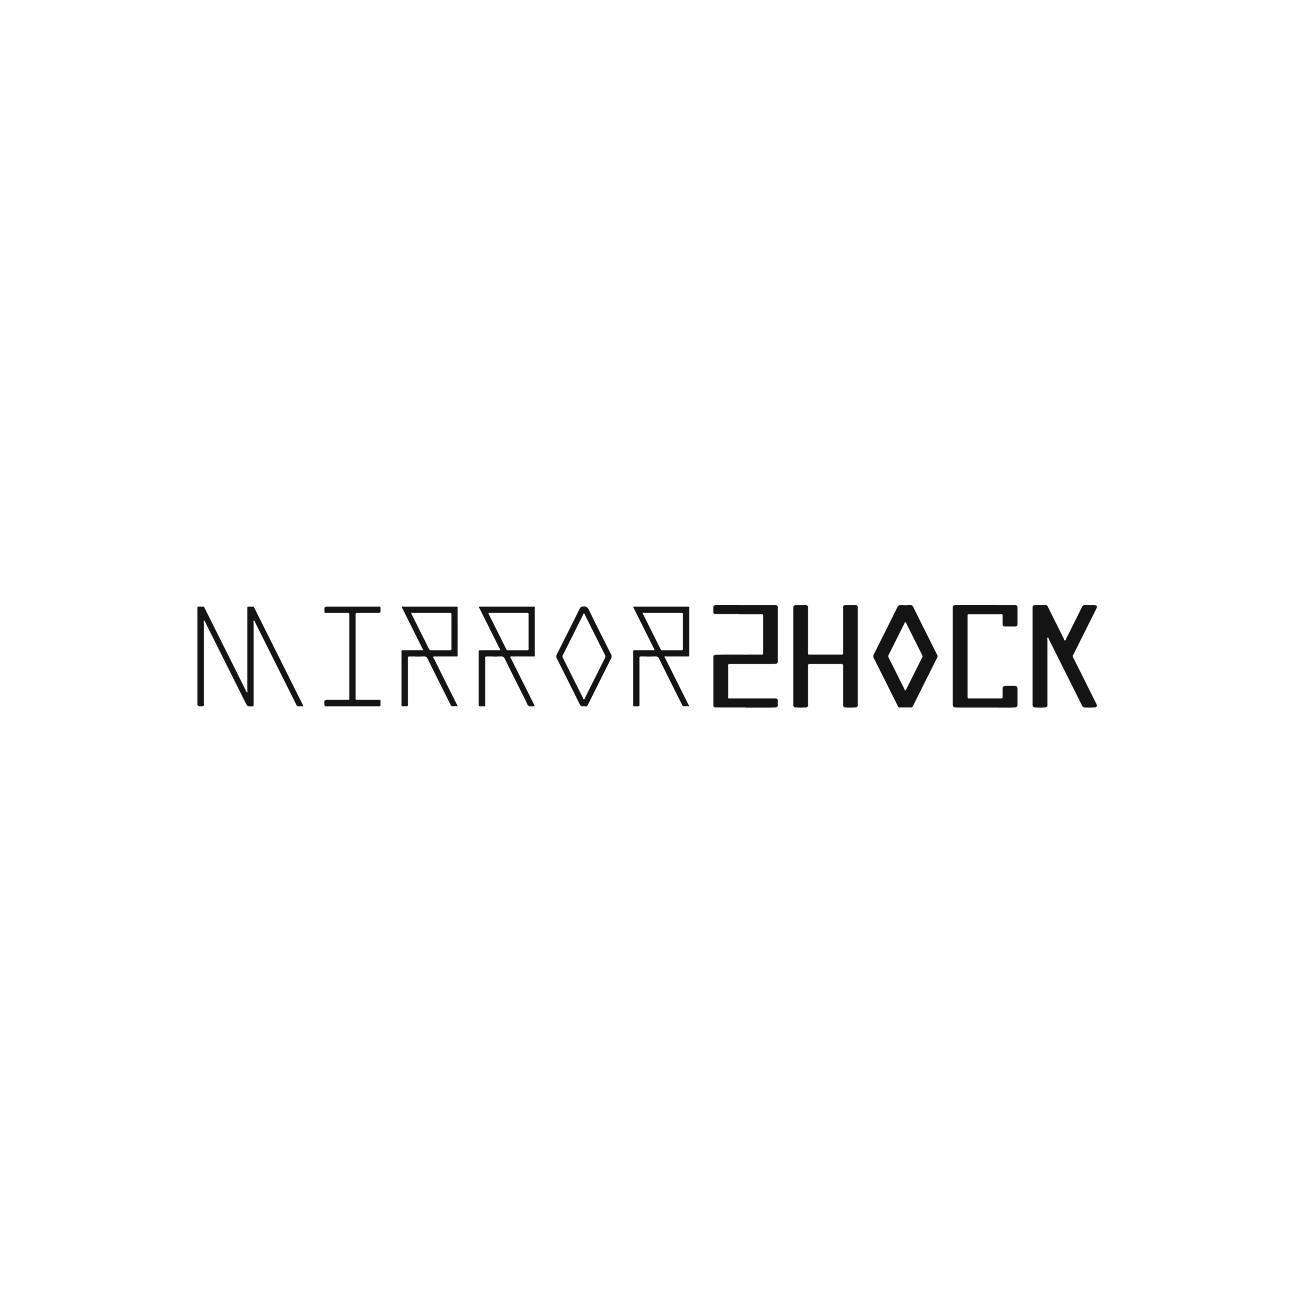 MirrorShock